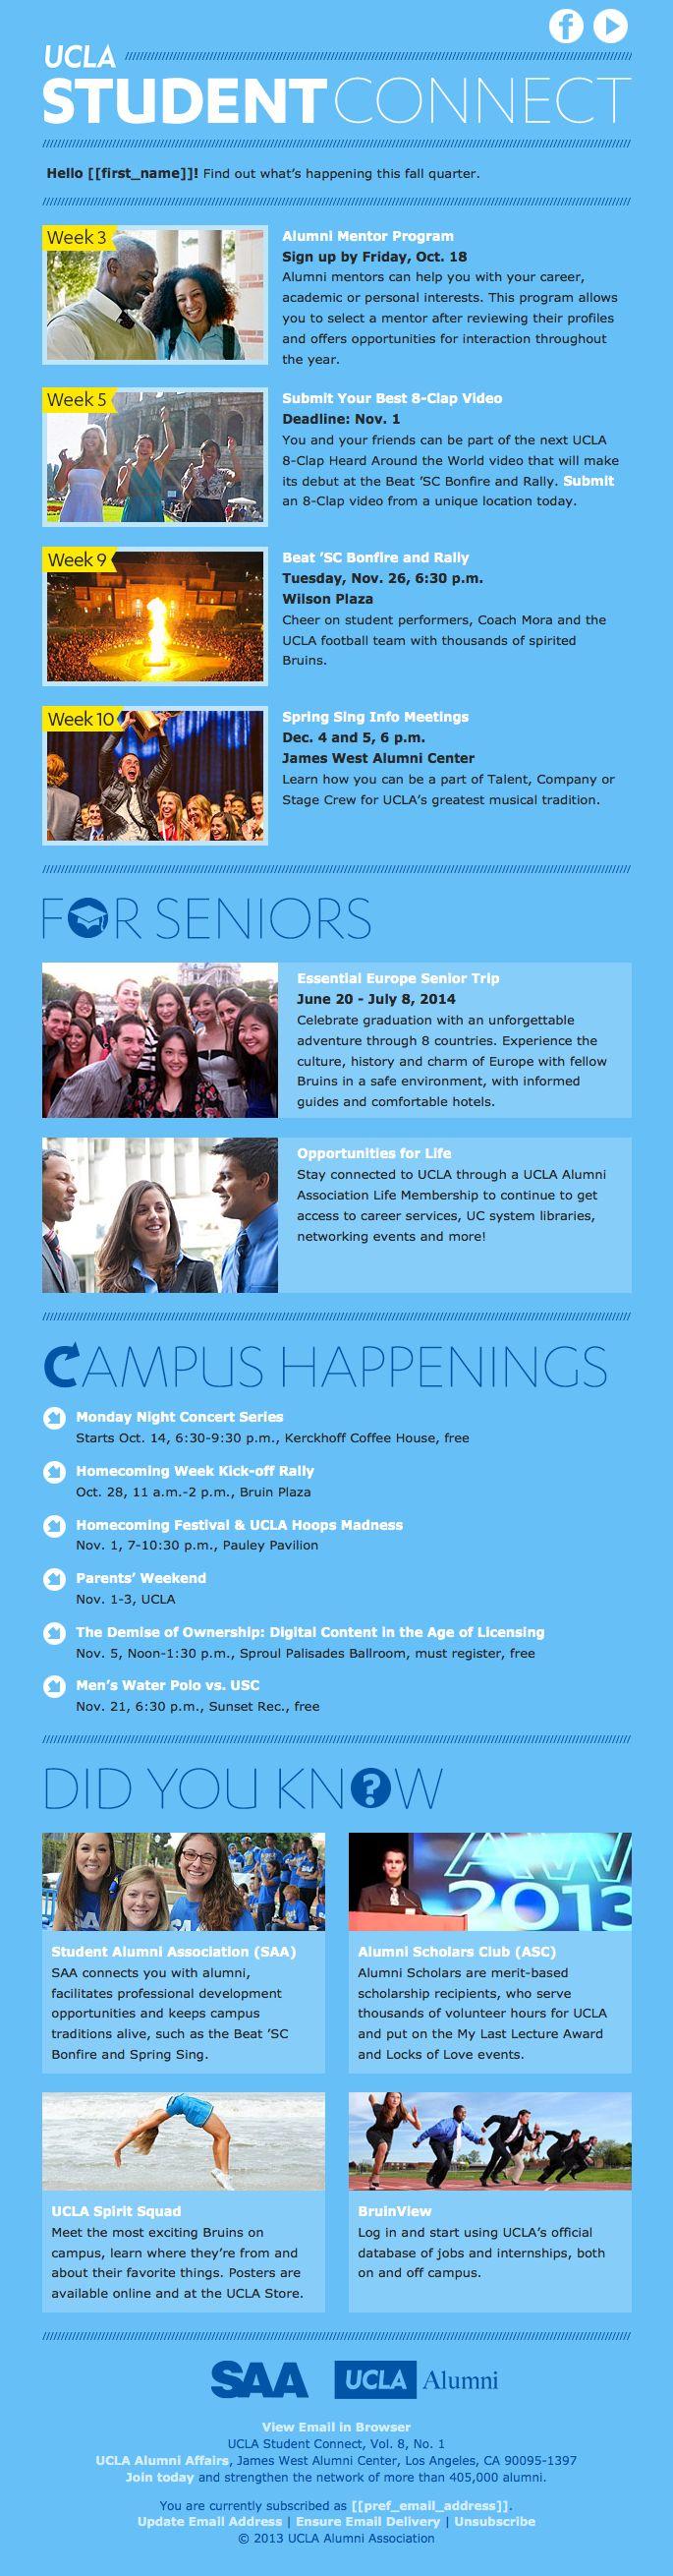 UCLA Alumni email newsletter